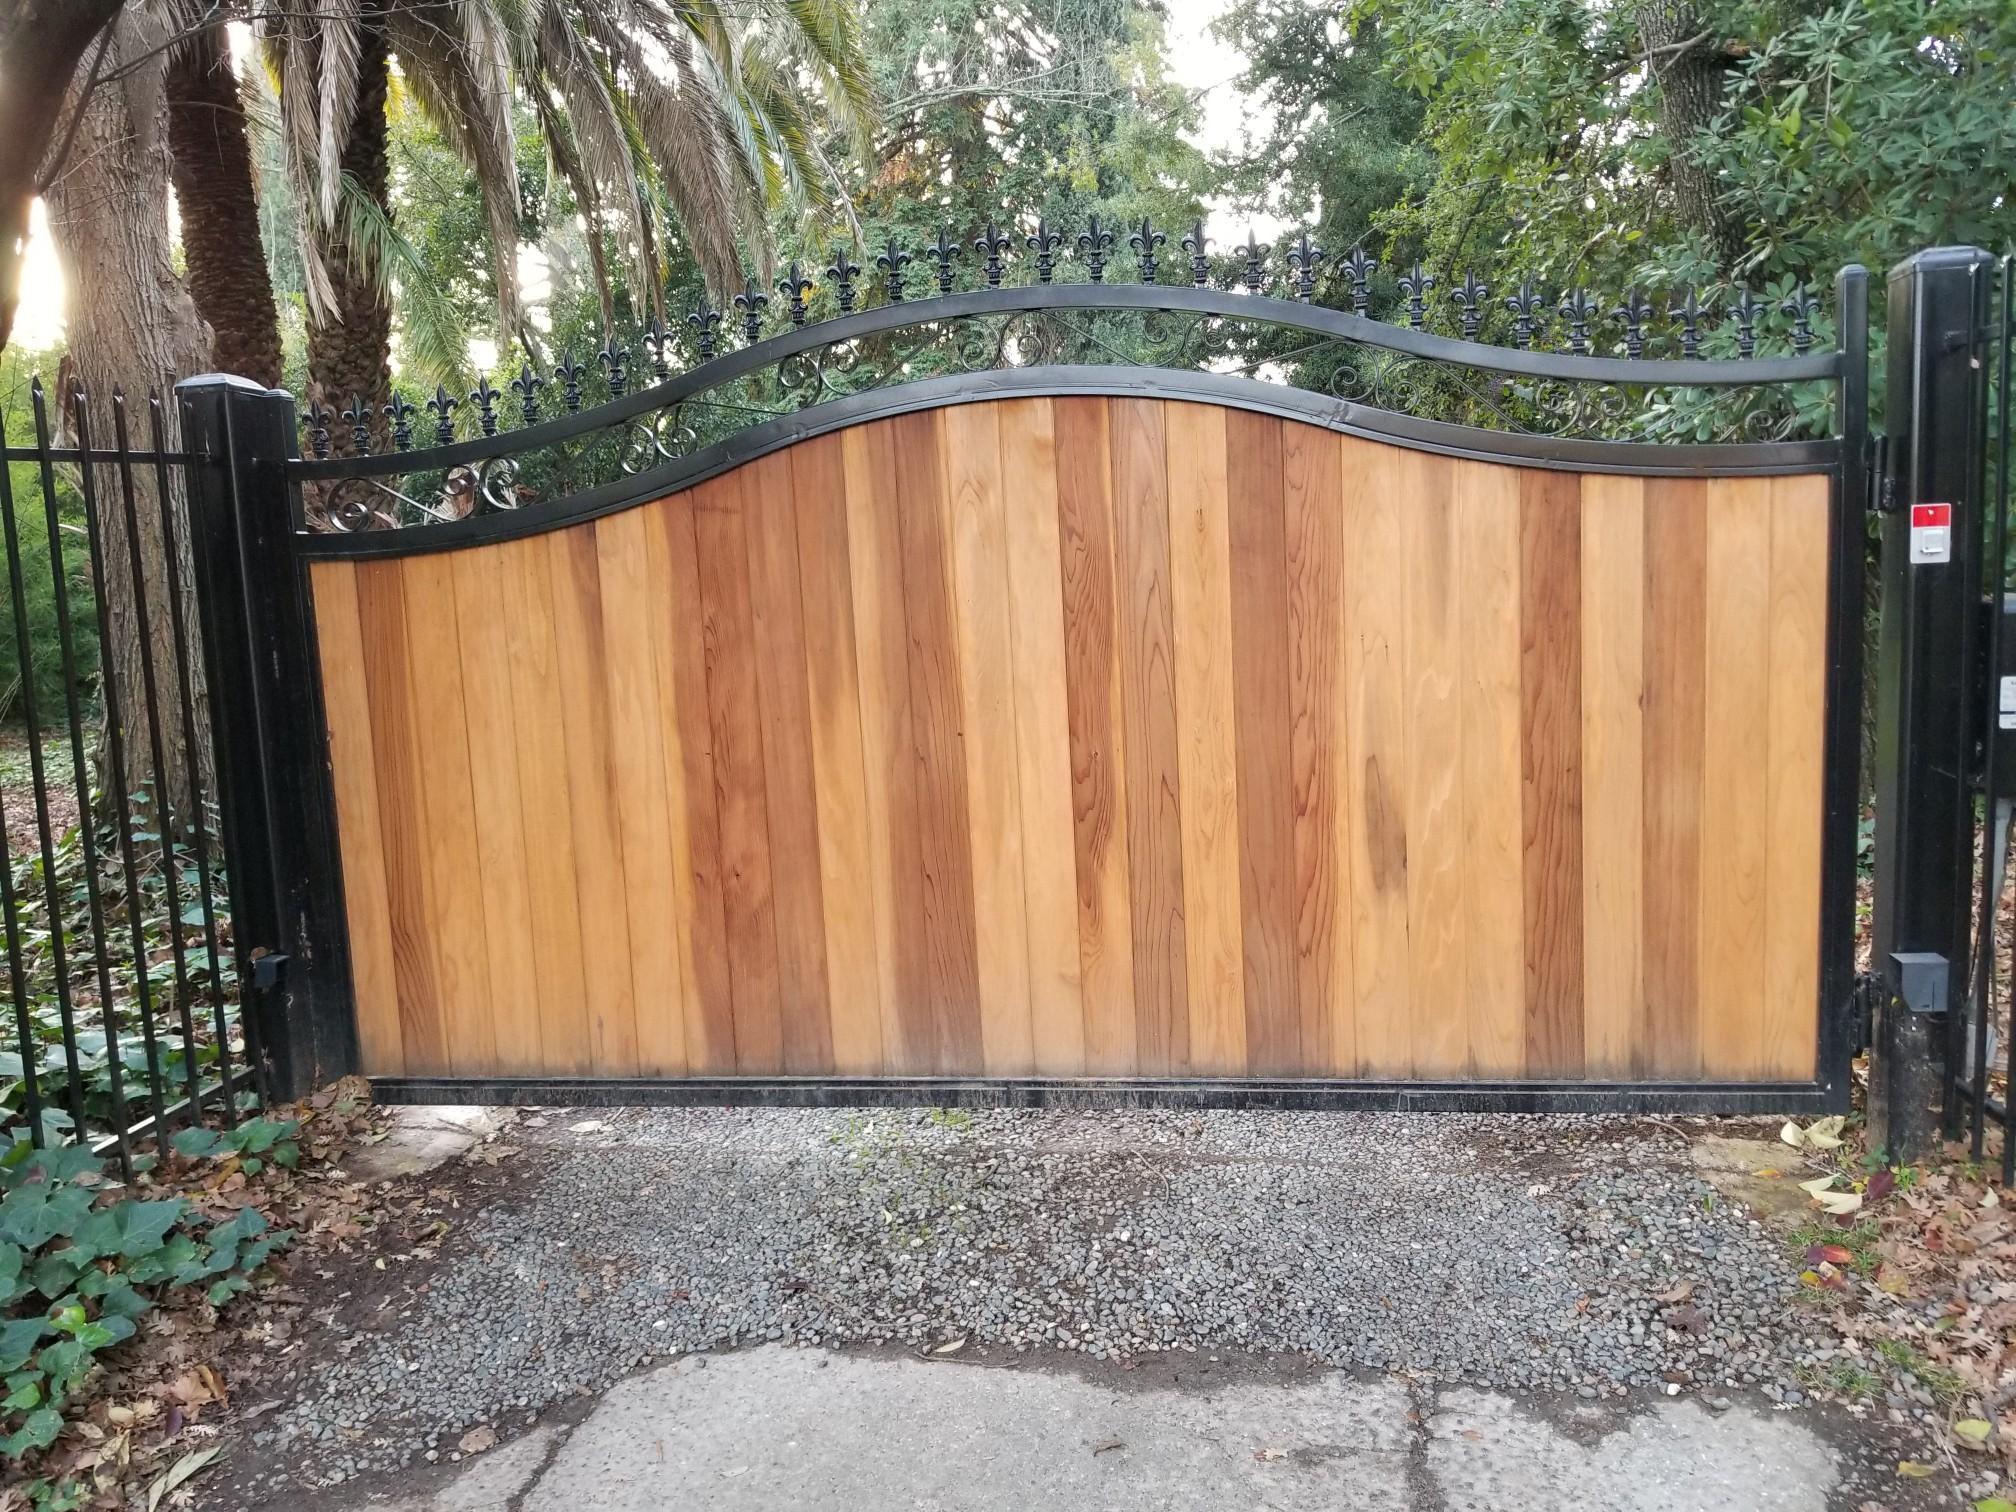 Iron/Metal Yard Gate